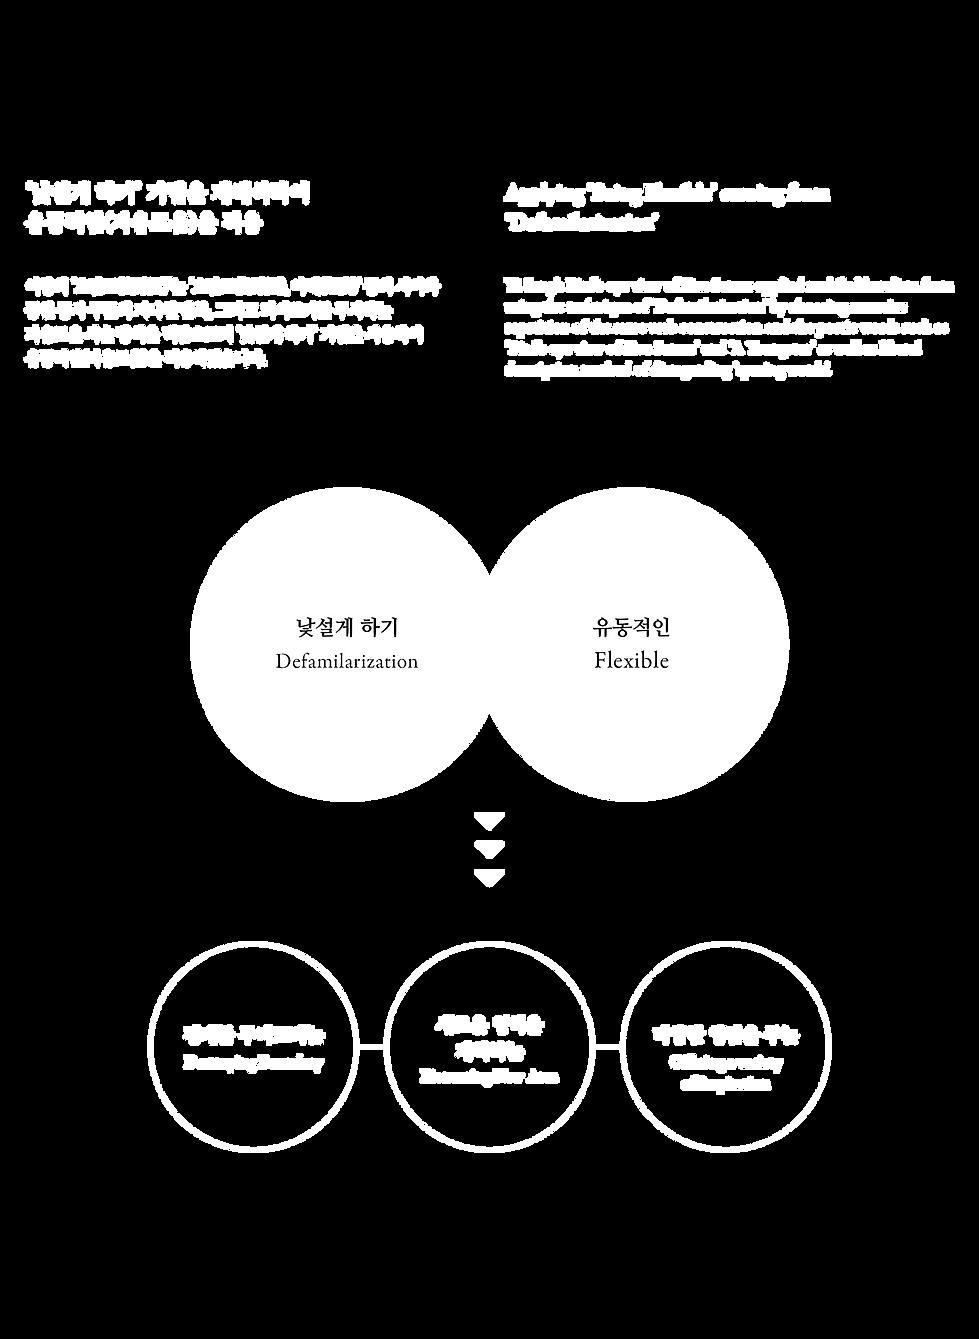 04_Design Concept_Concept_(Bg_black).png